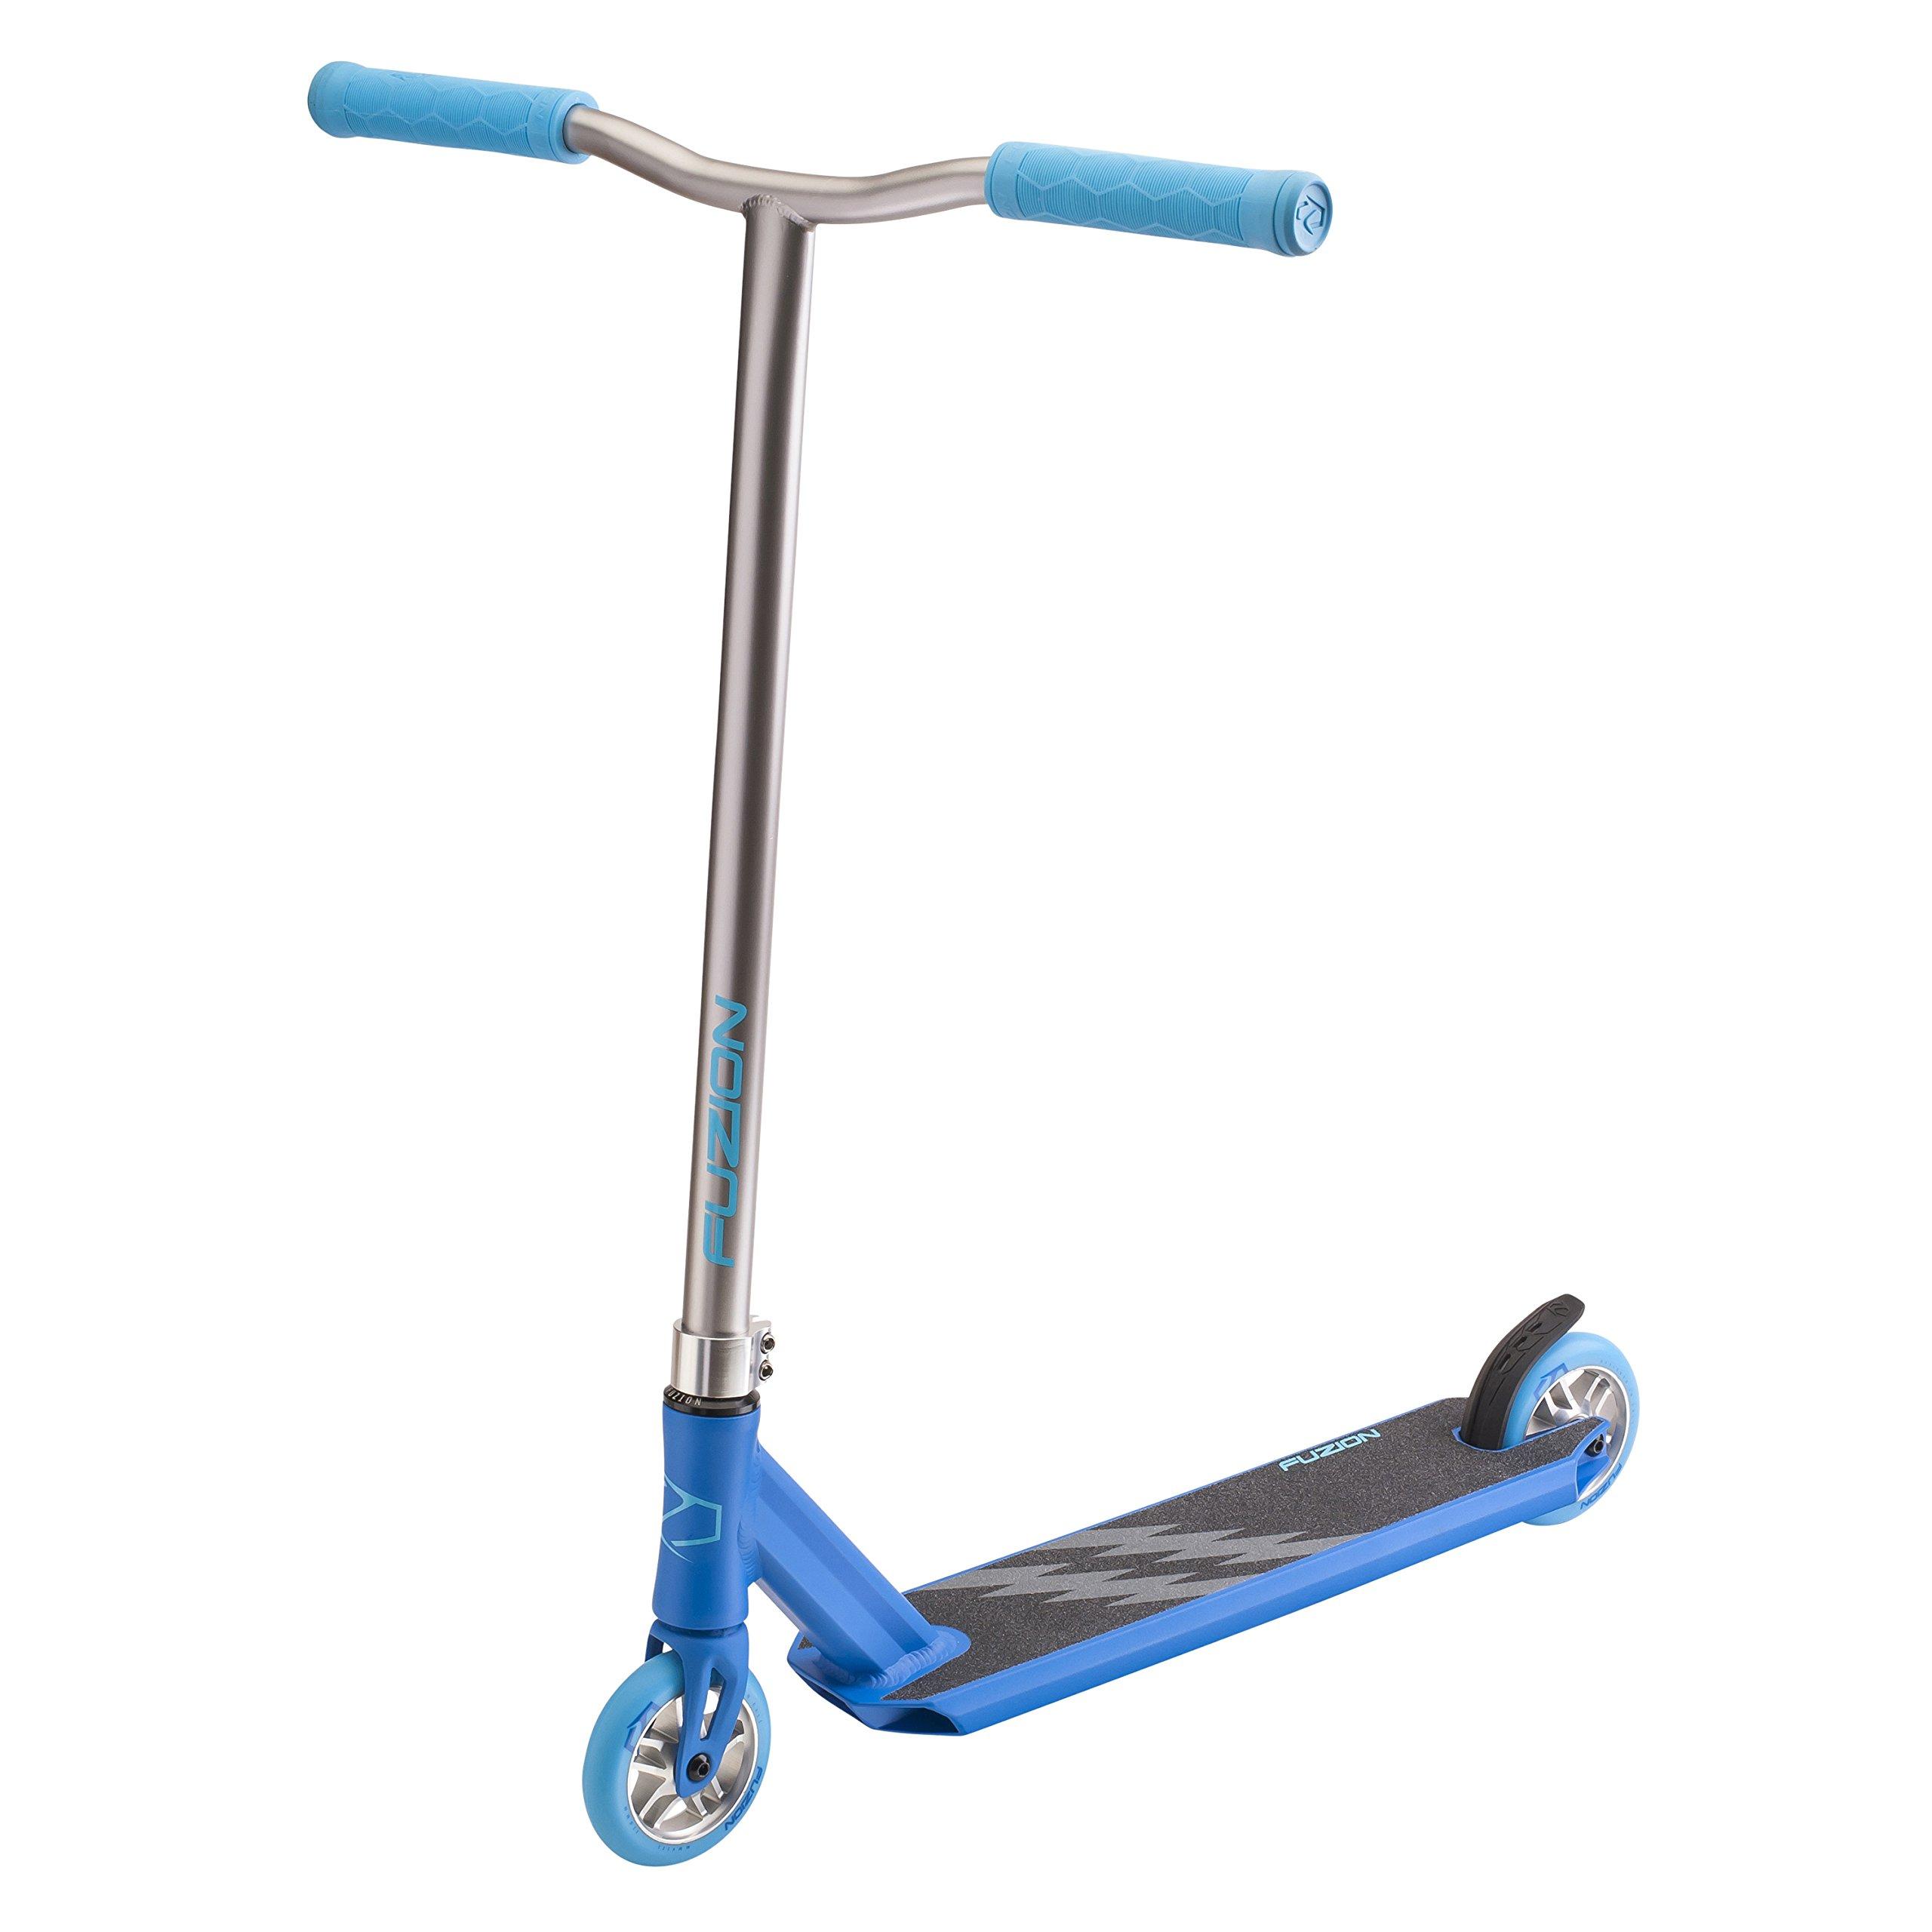 Fuzion Z250 Pro Scooter - All New Design - 4.37'' x 20.5'' Deck Dimensions - 110mm Aluminium Core Wheels - HIC Compression System -Chromoly T-Bars (2018 Blue)